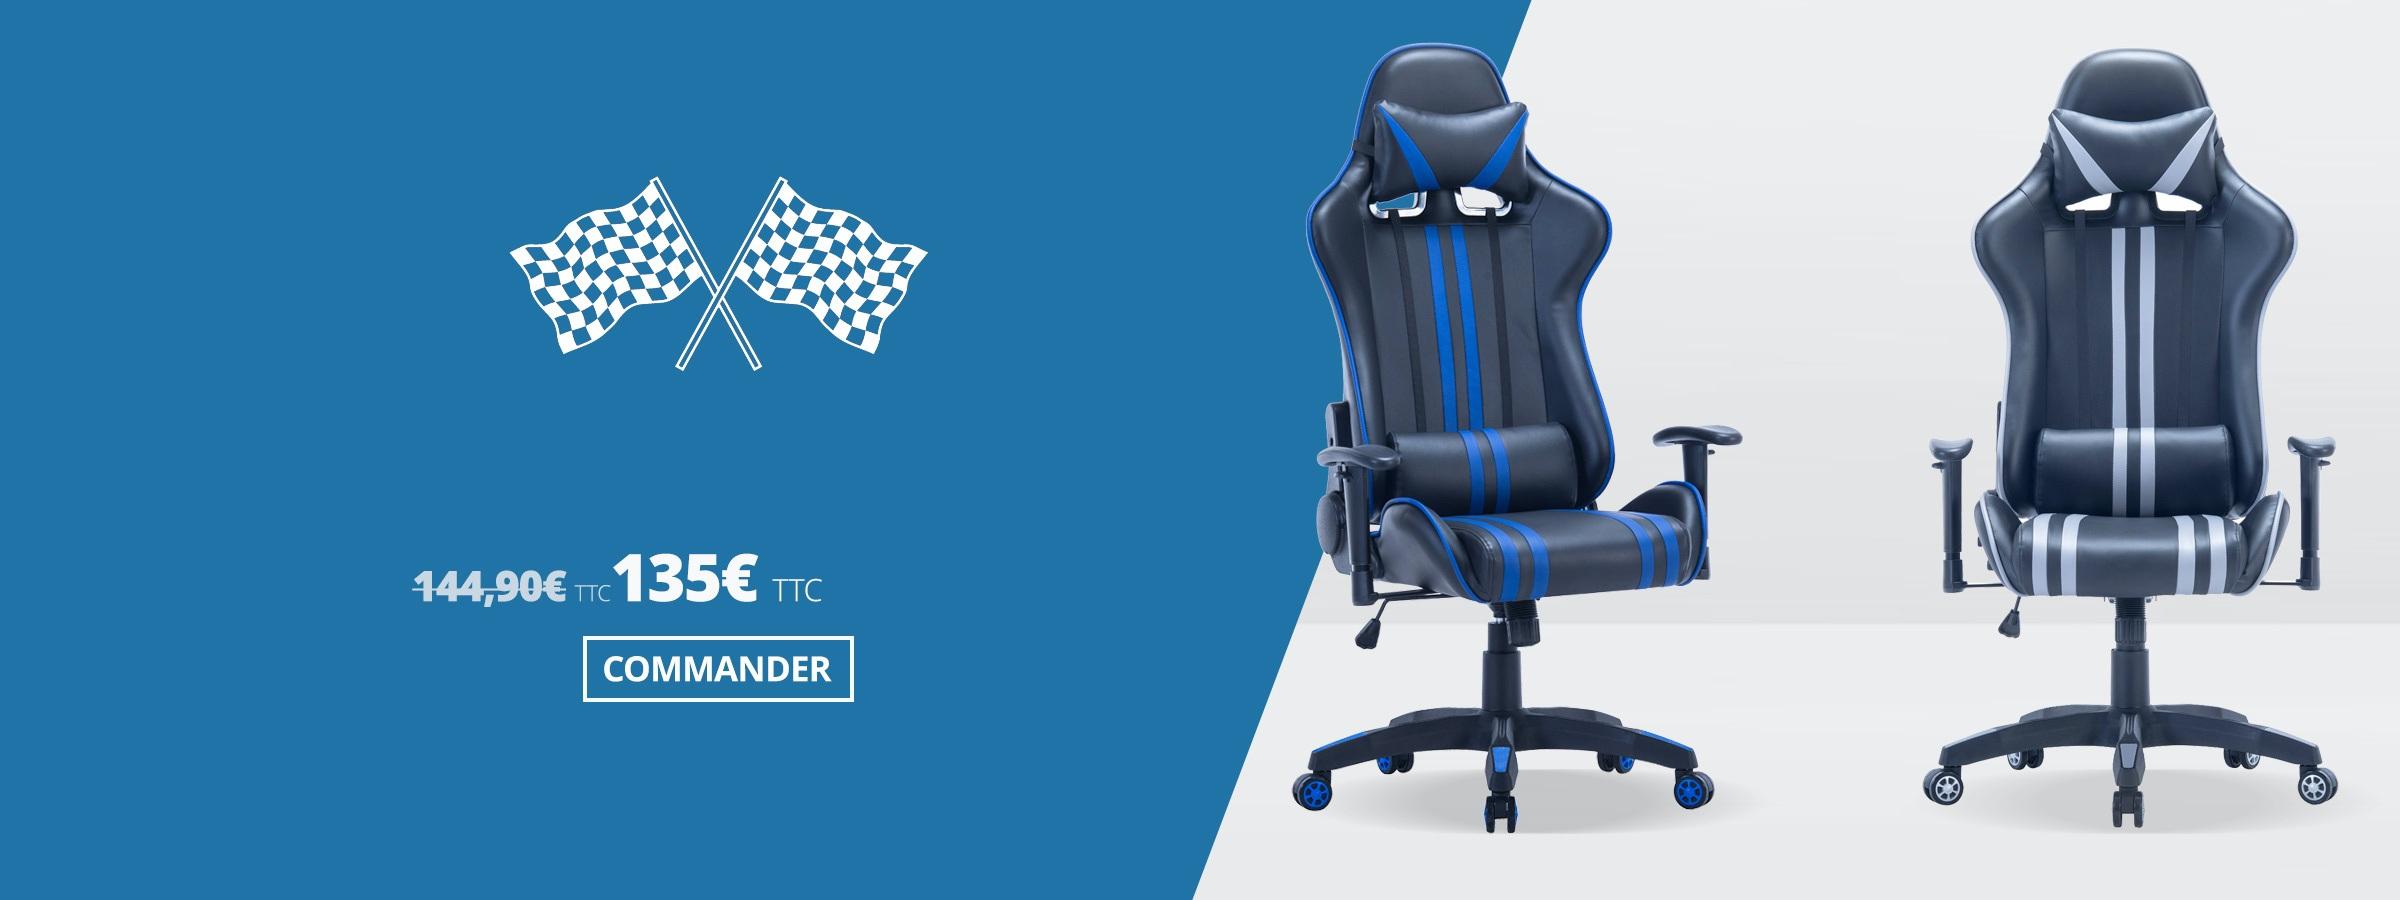 Fauteuil de Bureau Racing ONE – Chaise Bureau GAMER